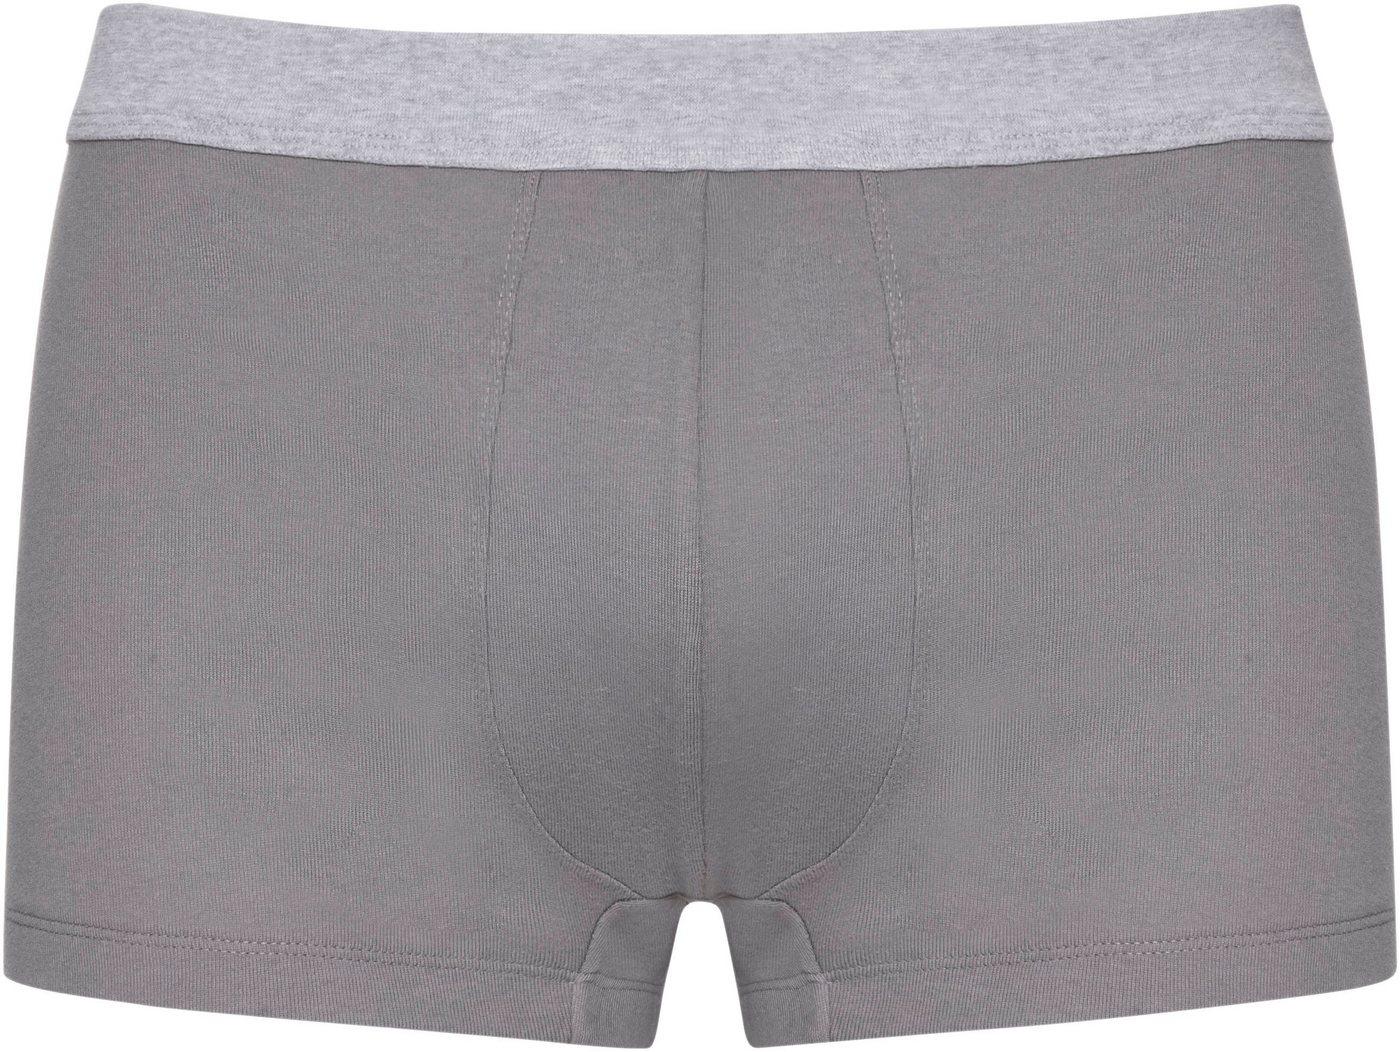 - Herren wäschepur Pants blau, bunt, mehrfarbig, grau | 08901594329367